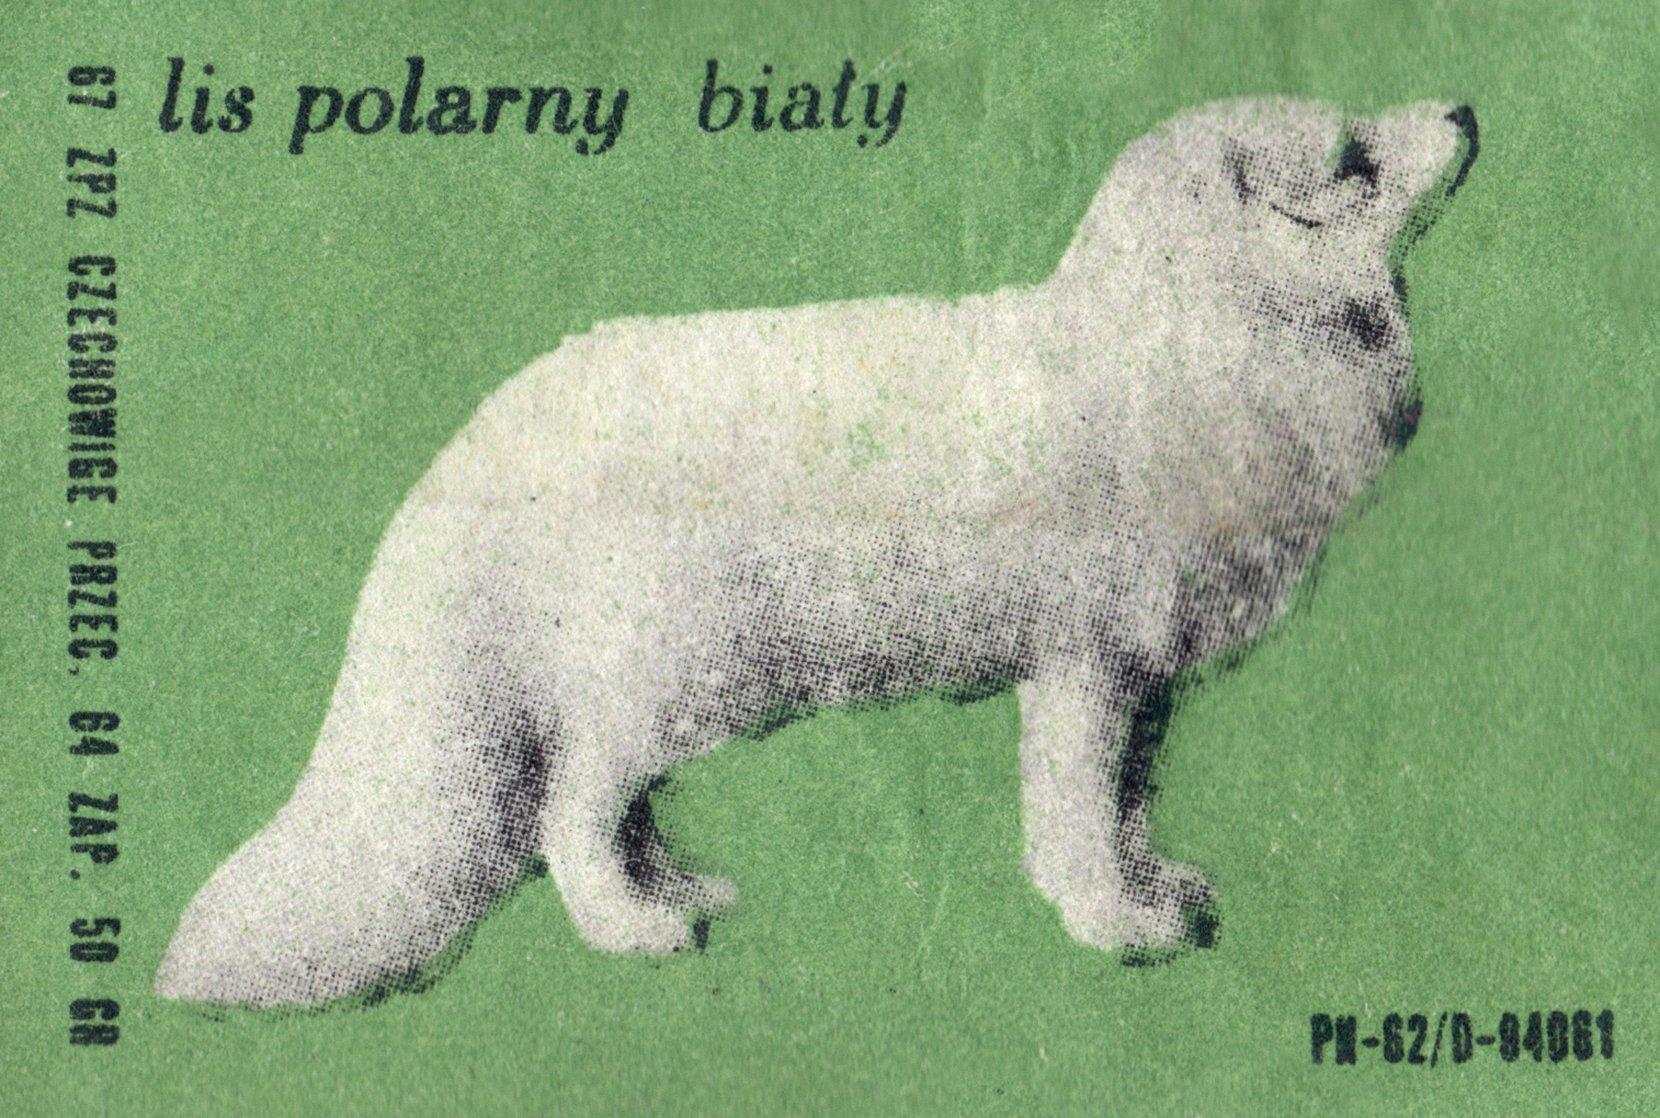 etykieta 60: lis polarny biały (1967) phillumeny matchbox labels